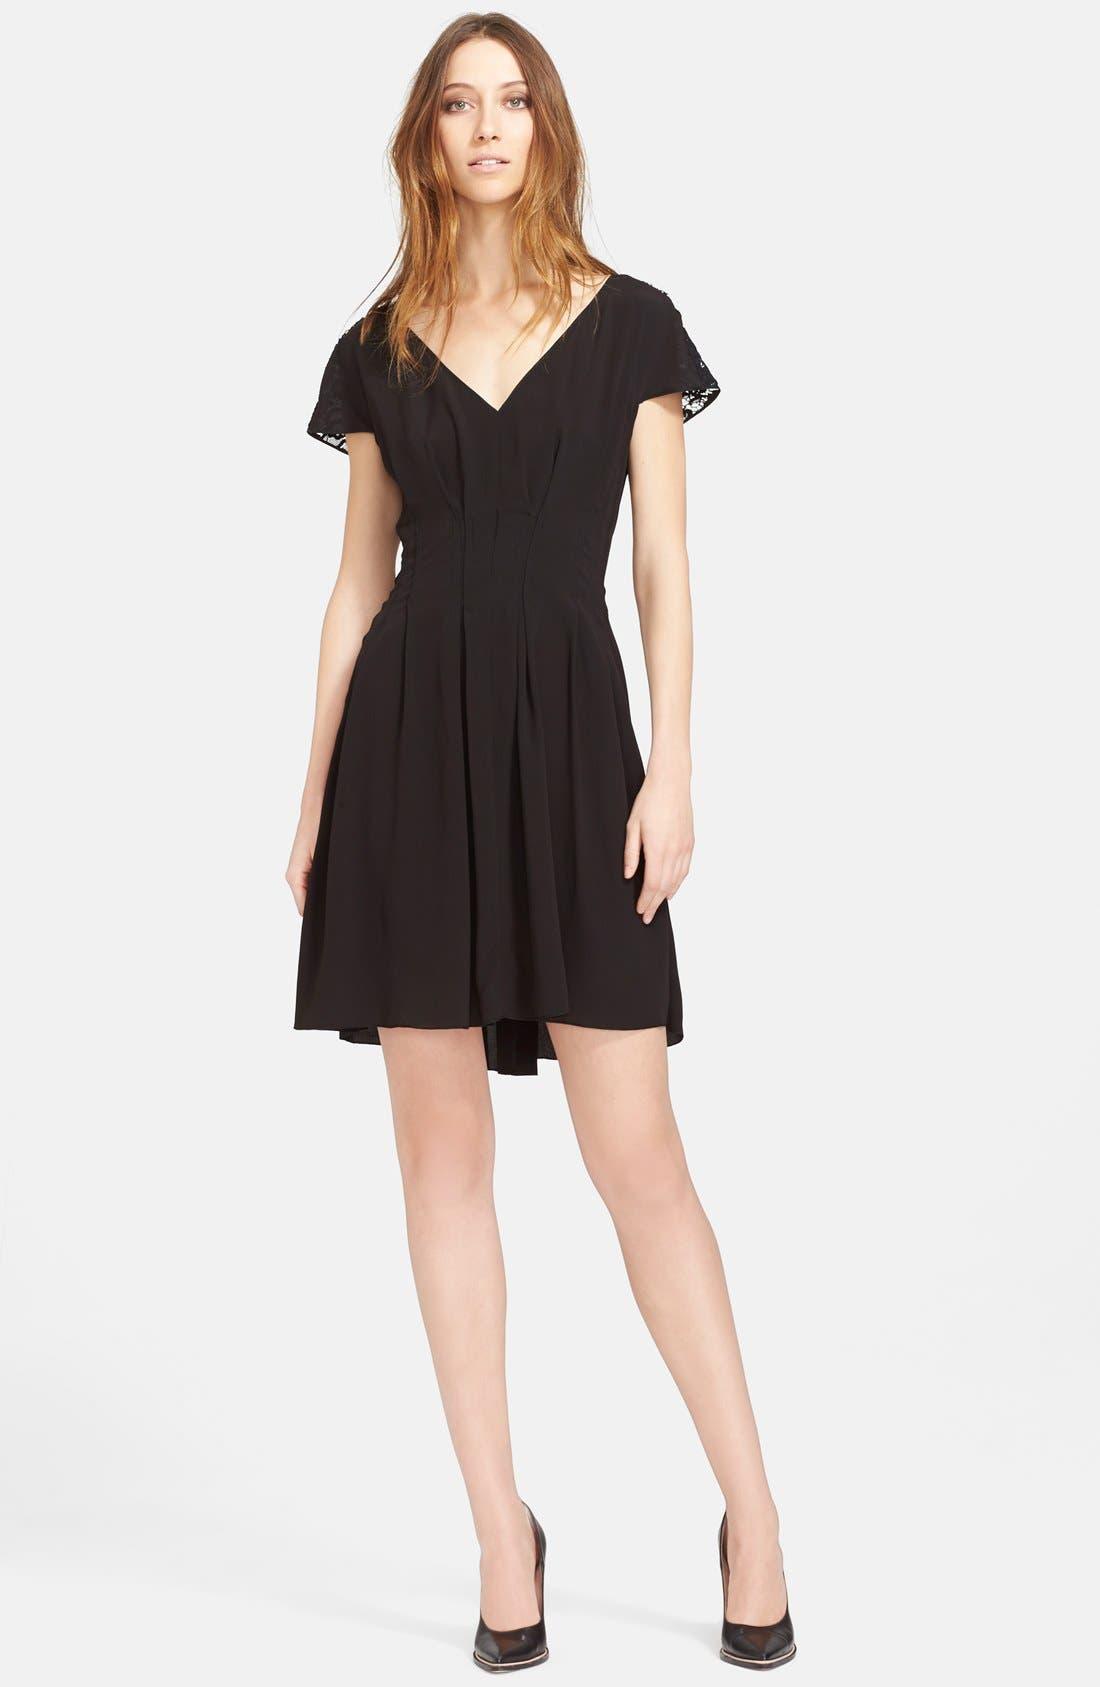 Alternate Image 1 Selected - Nina Ricci Lace Trim Crepe Dress